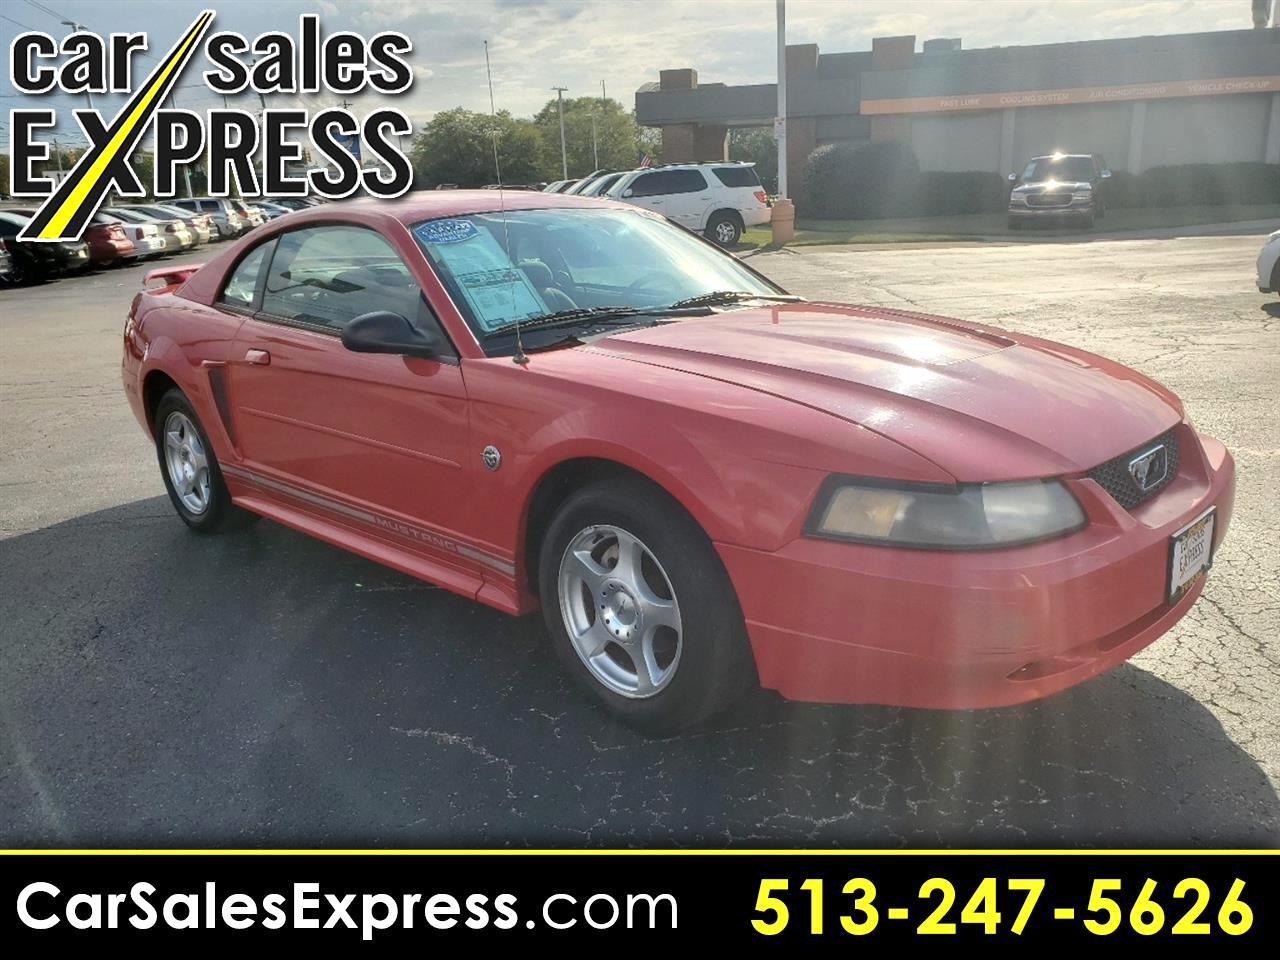 2004 Ford Mustang V6